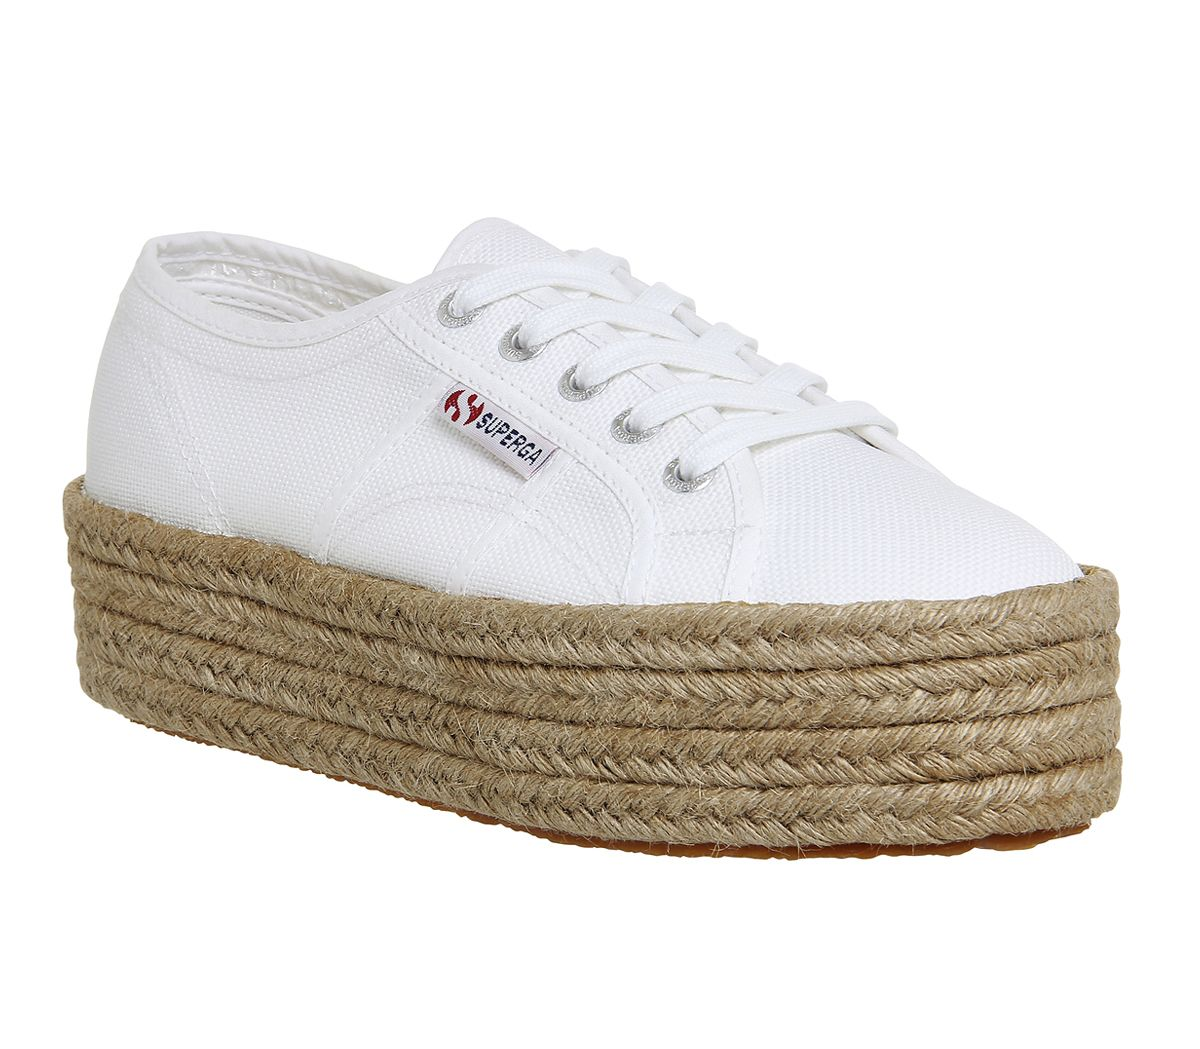 c6b520928aa Superga 2790 White Espadrille - Hers trainers